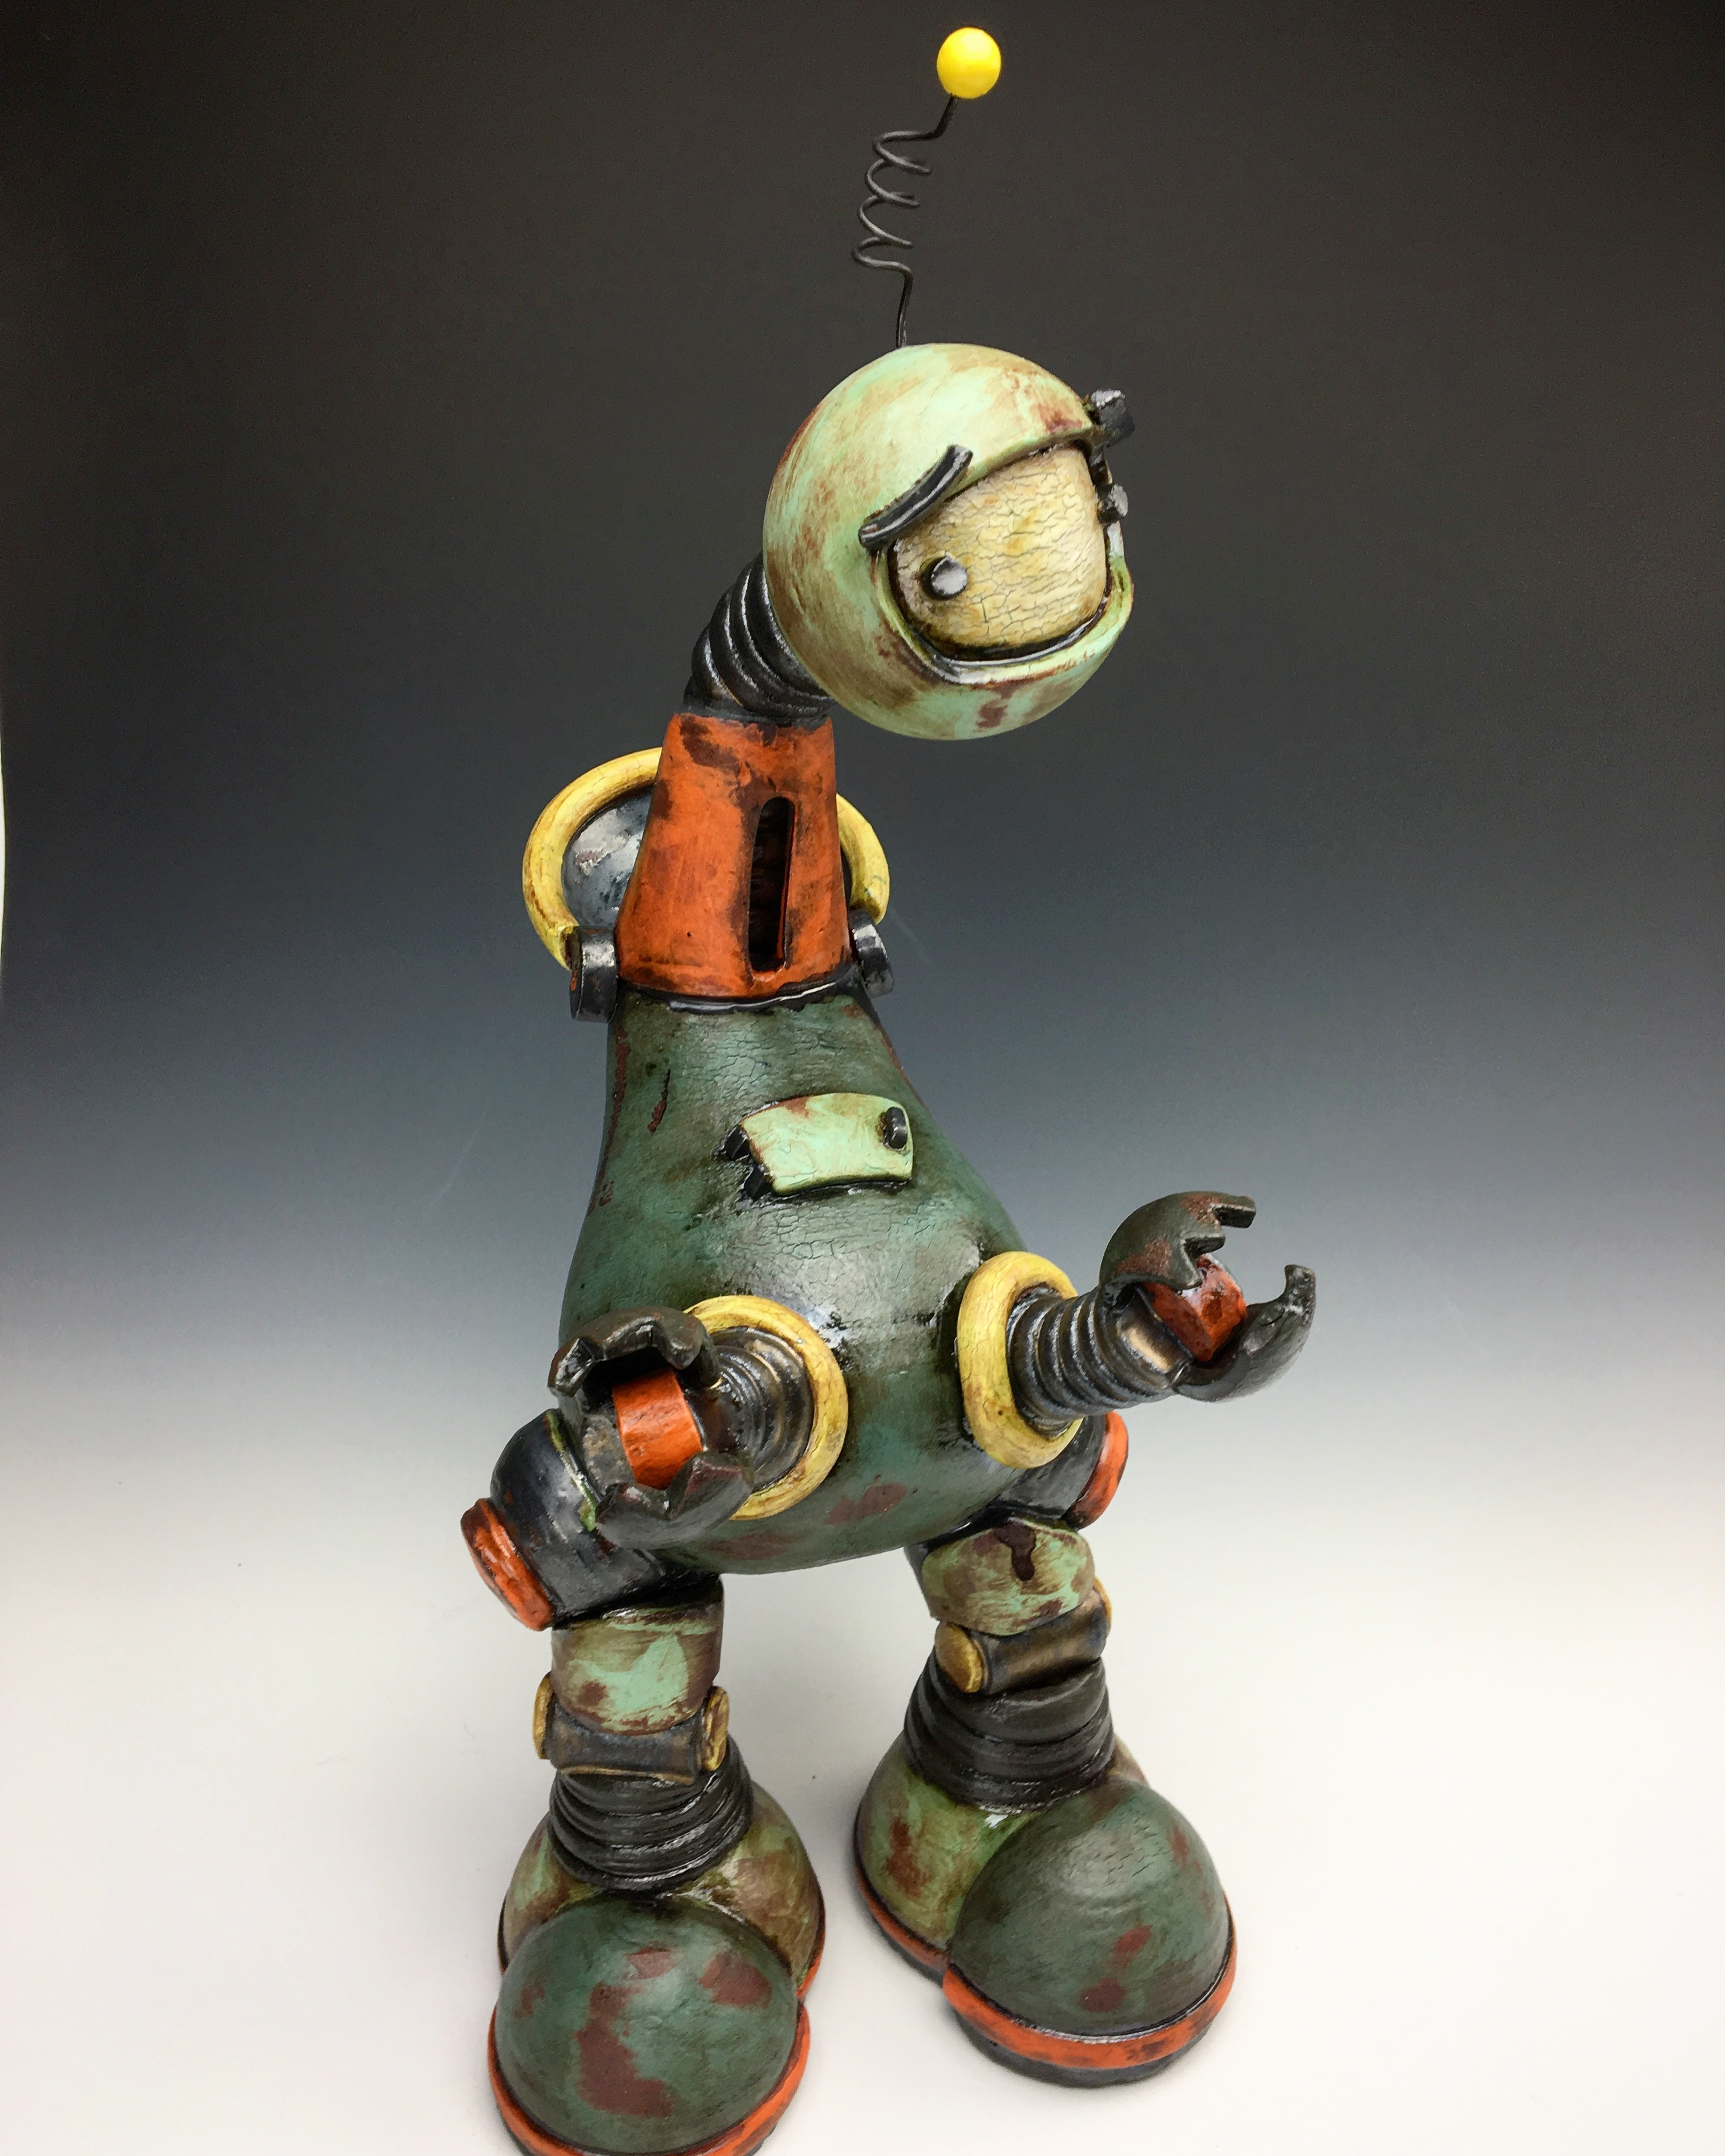 Rescue Scout Robot